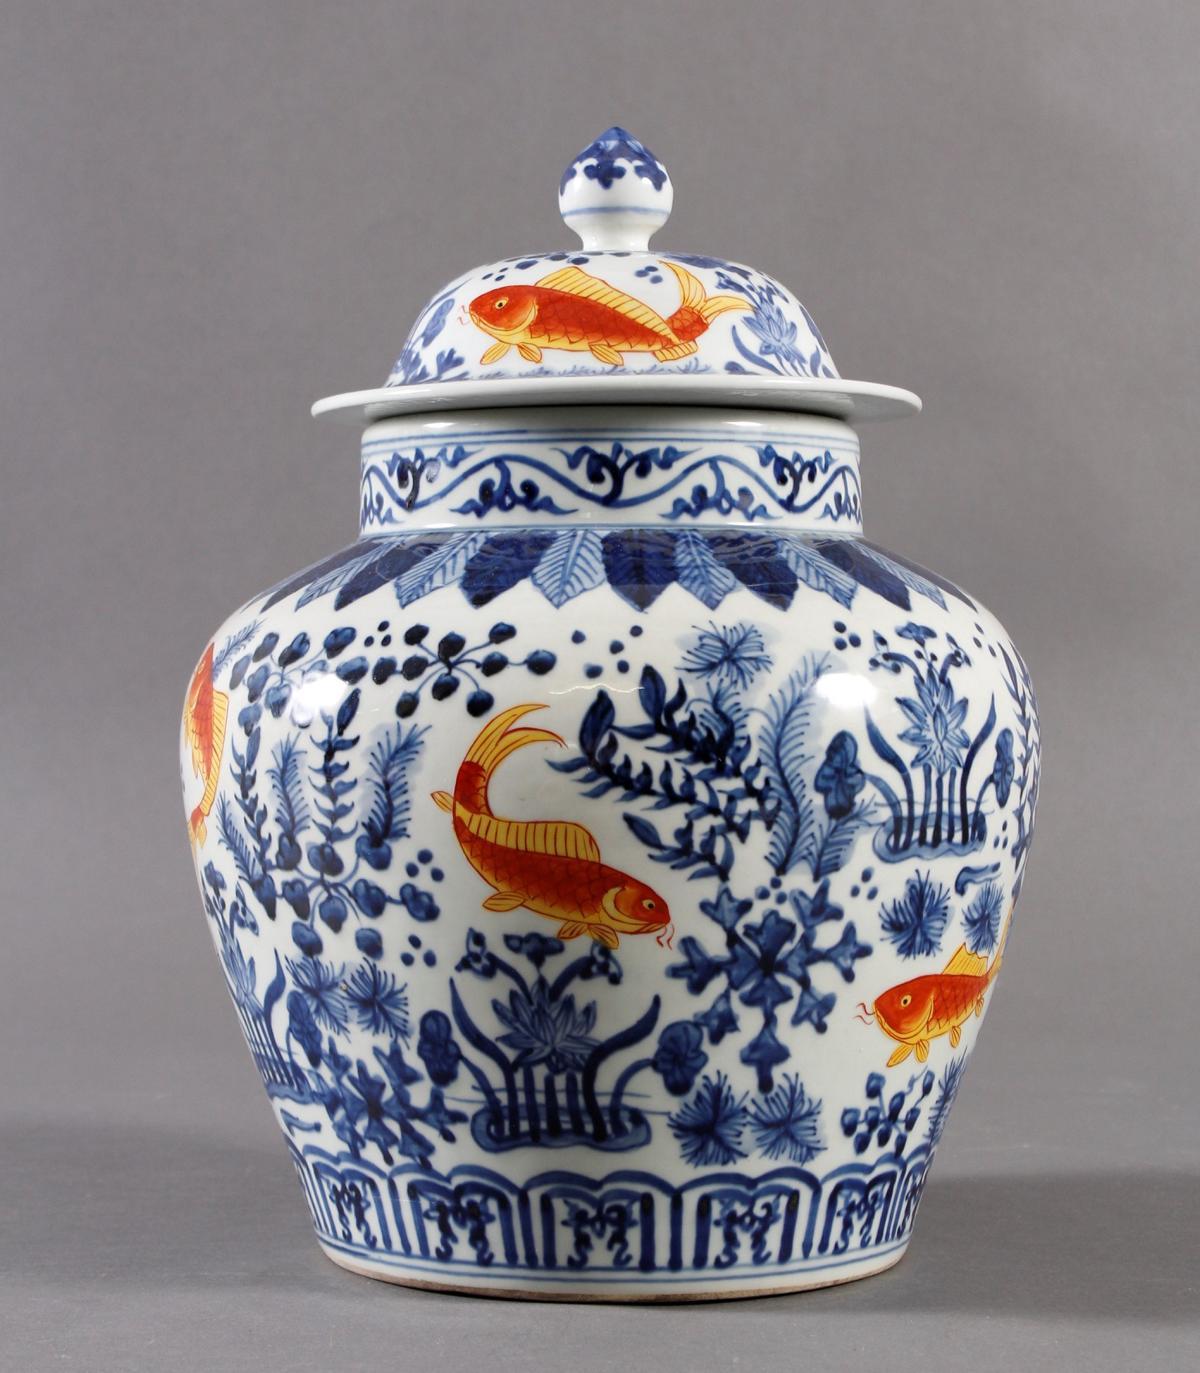 Porzellan Deckelvase, China